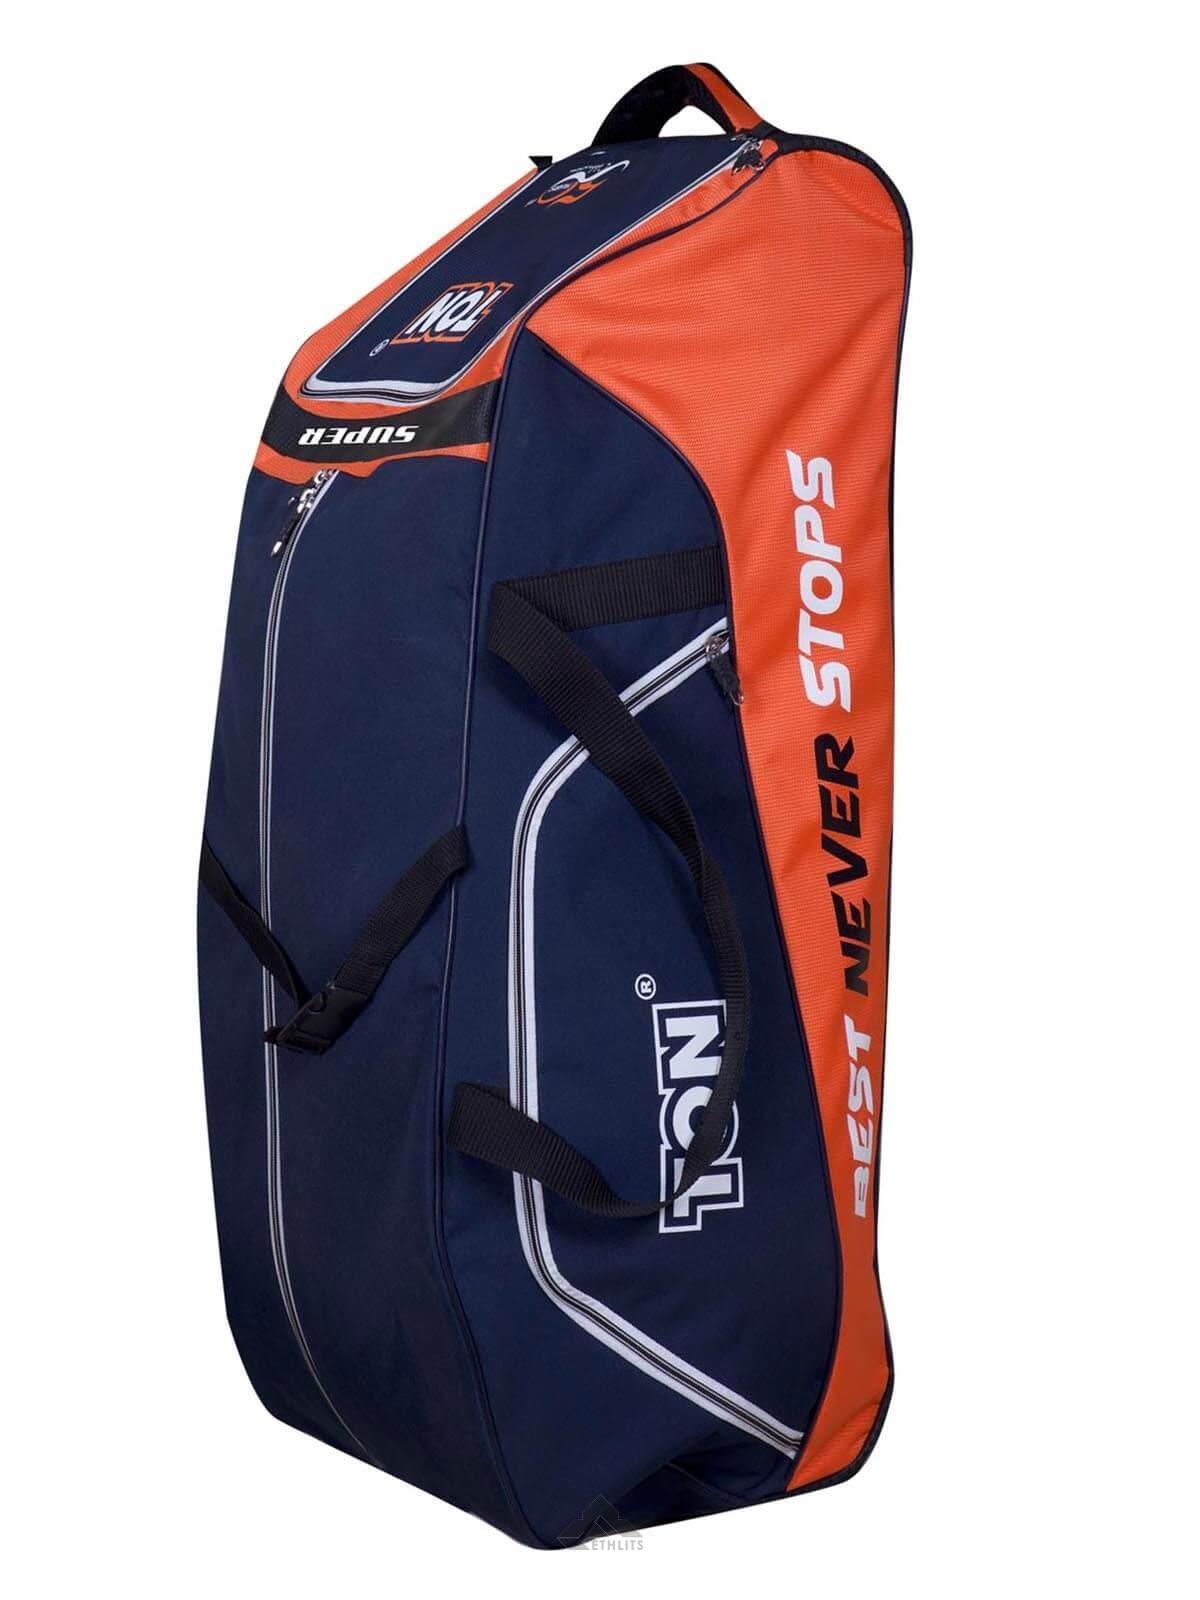 SS Cricket SS Ton Super Cricket Kit Bag